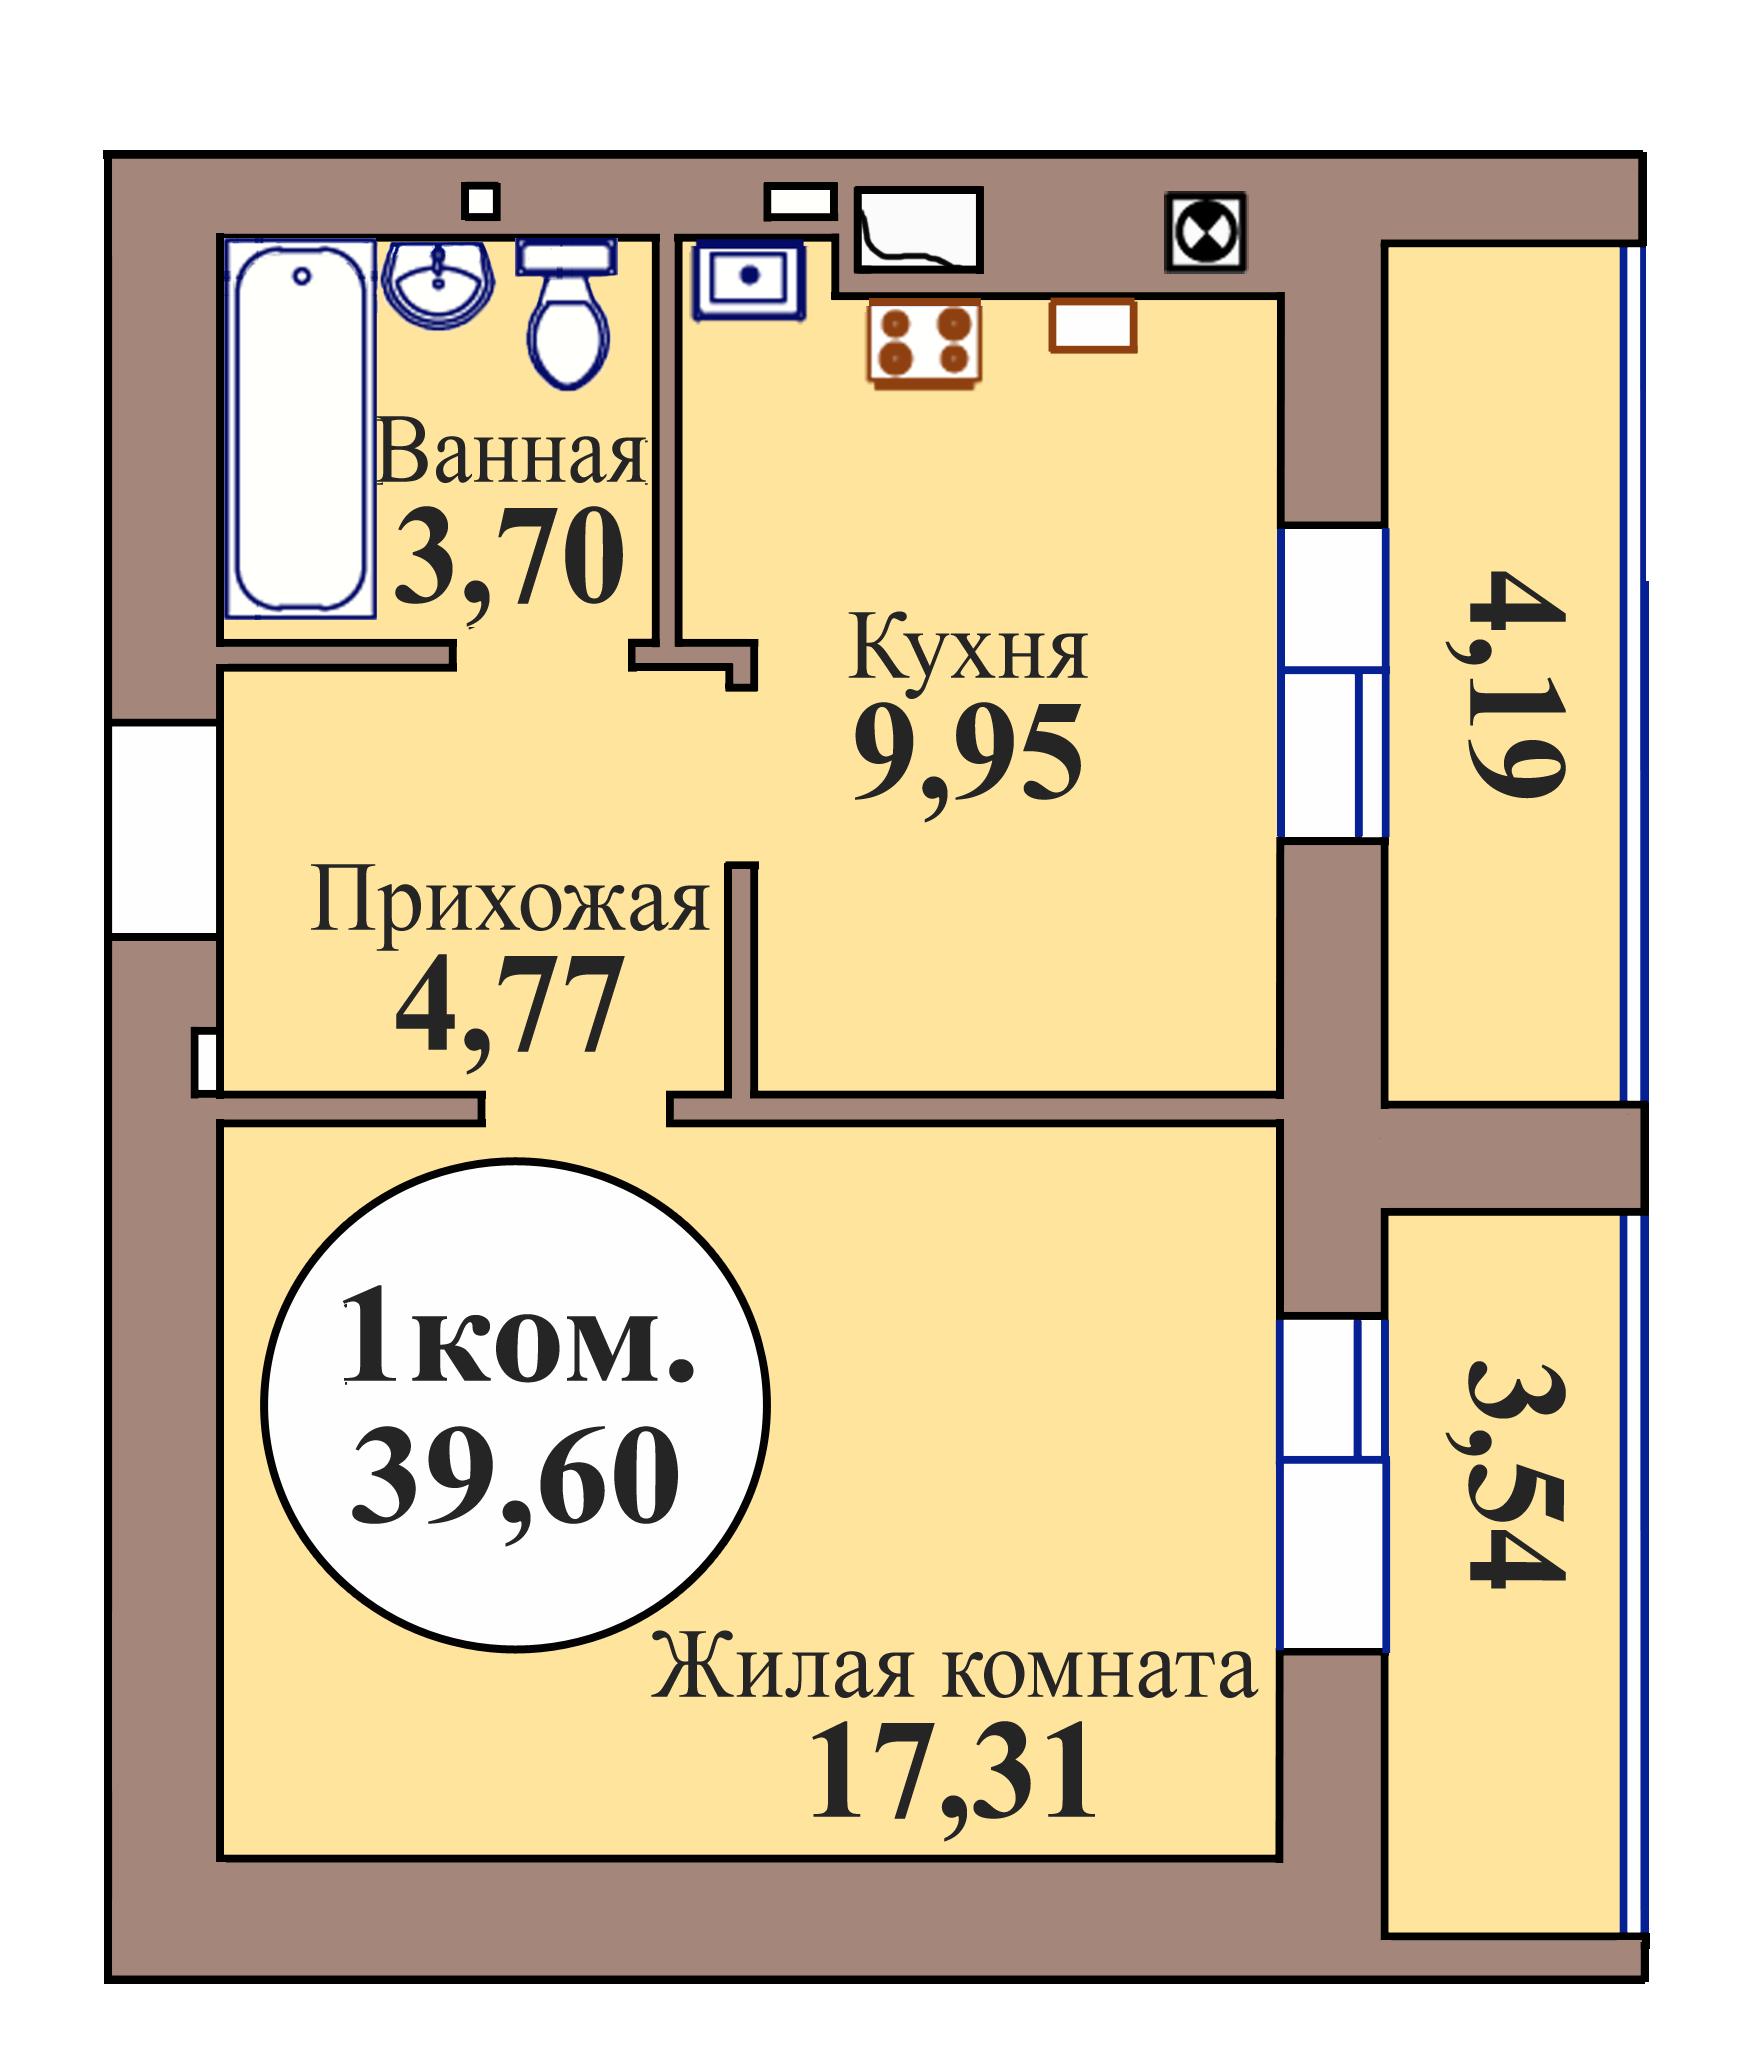 1-комн. кв. по пер. Калининградский, 5 кв. 89 в Калининграде